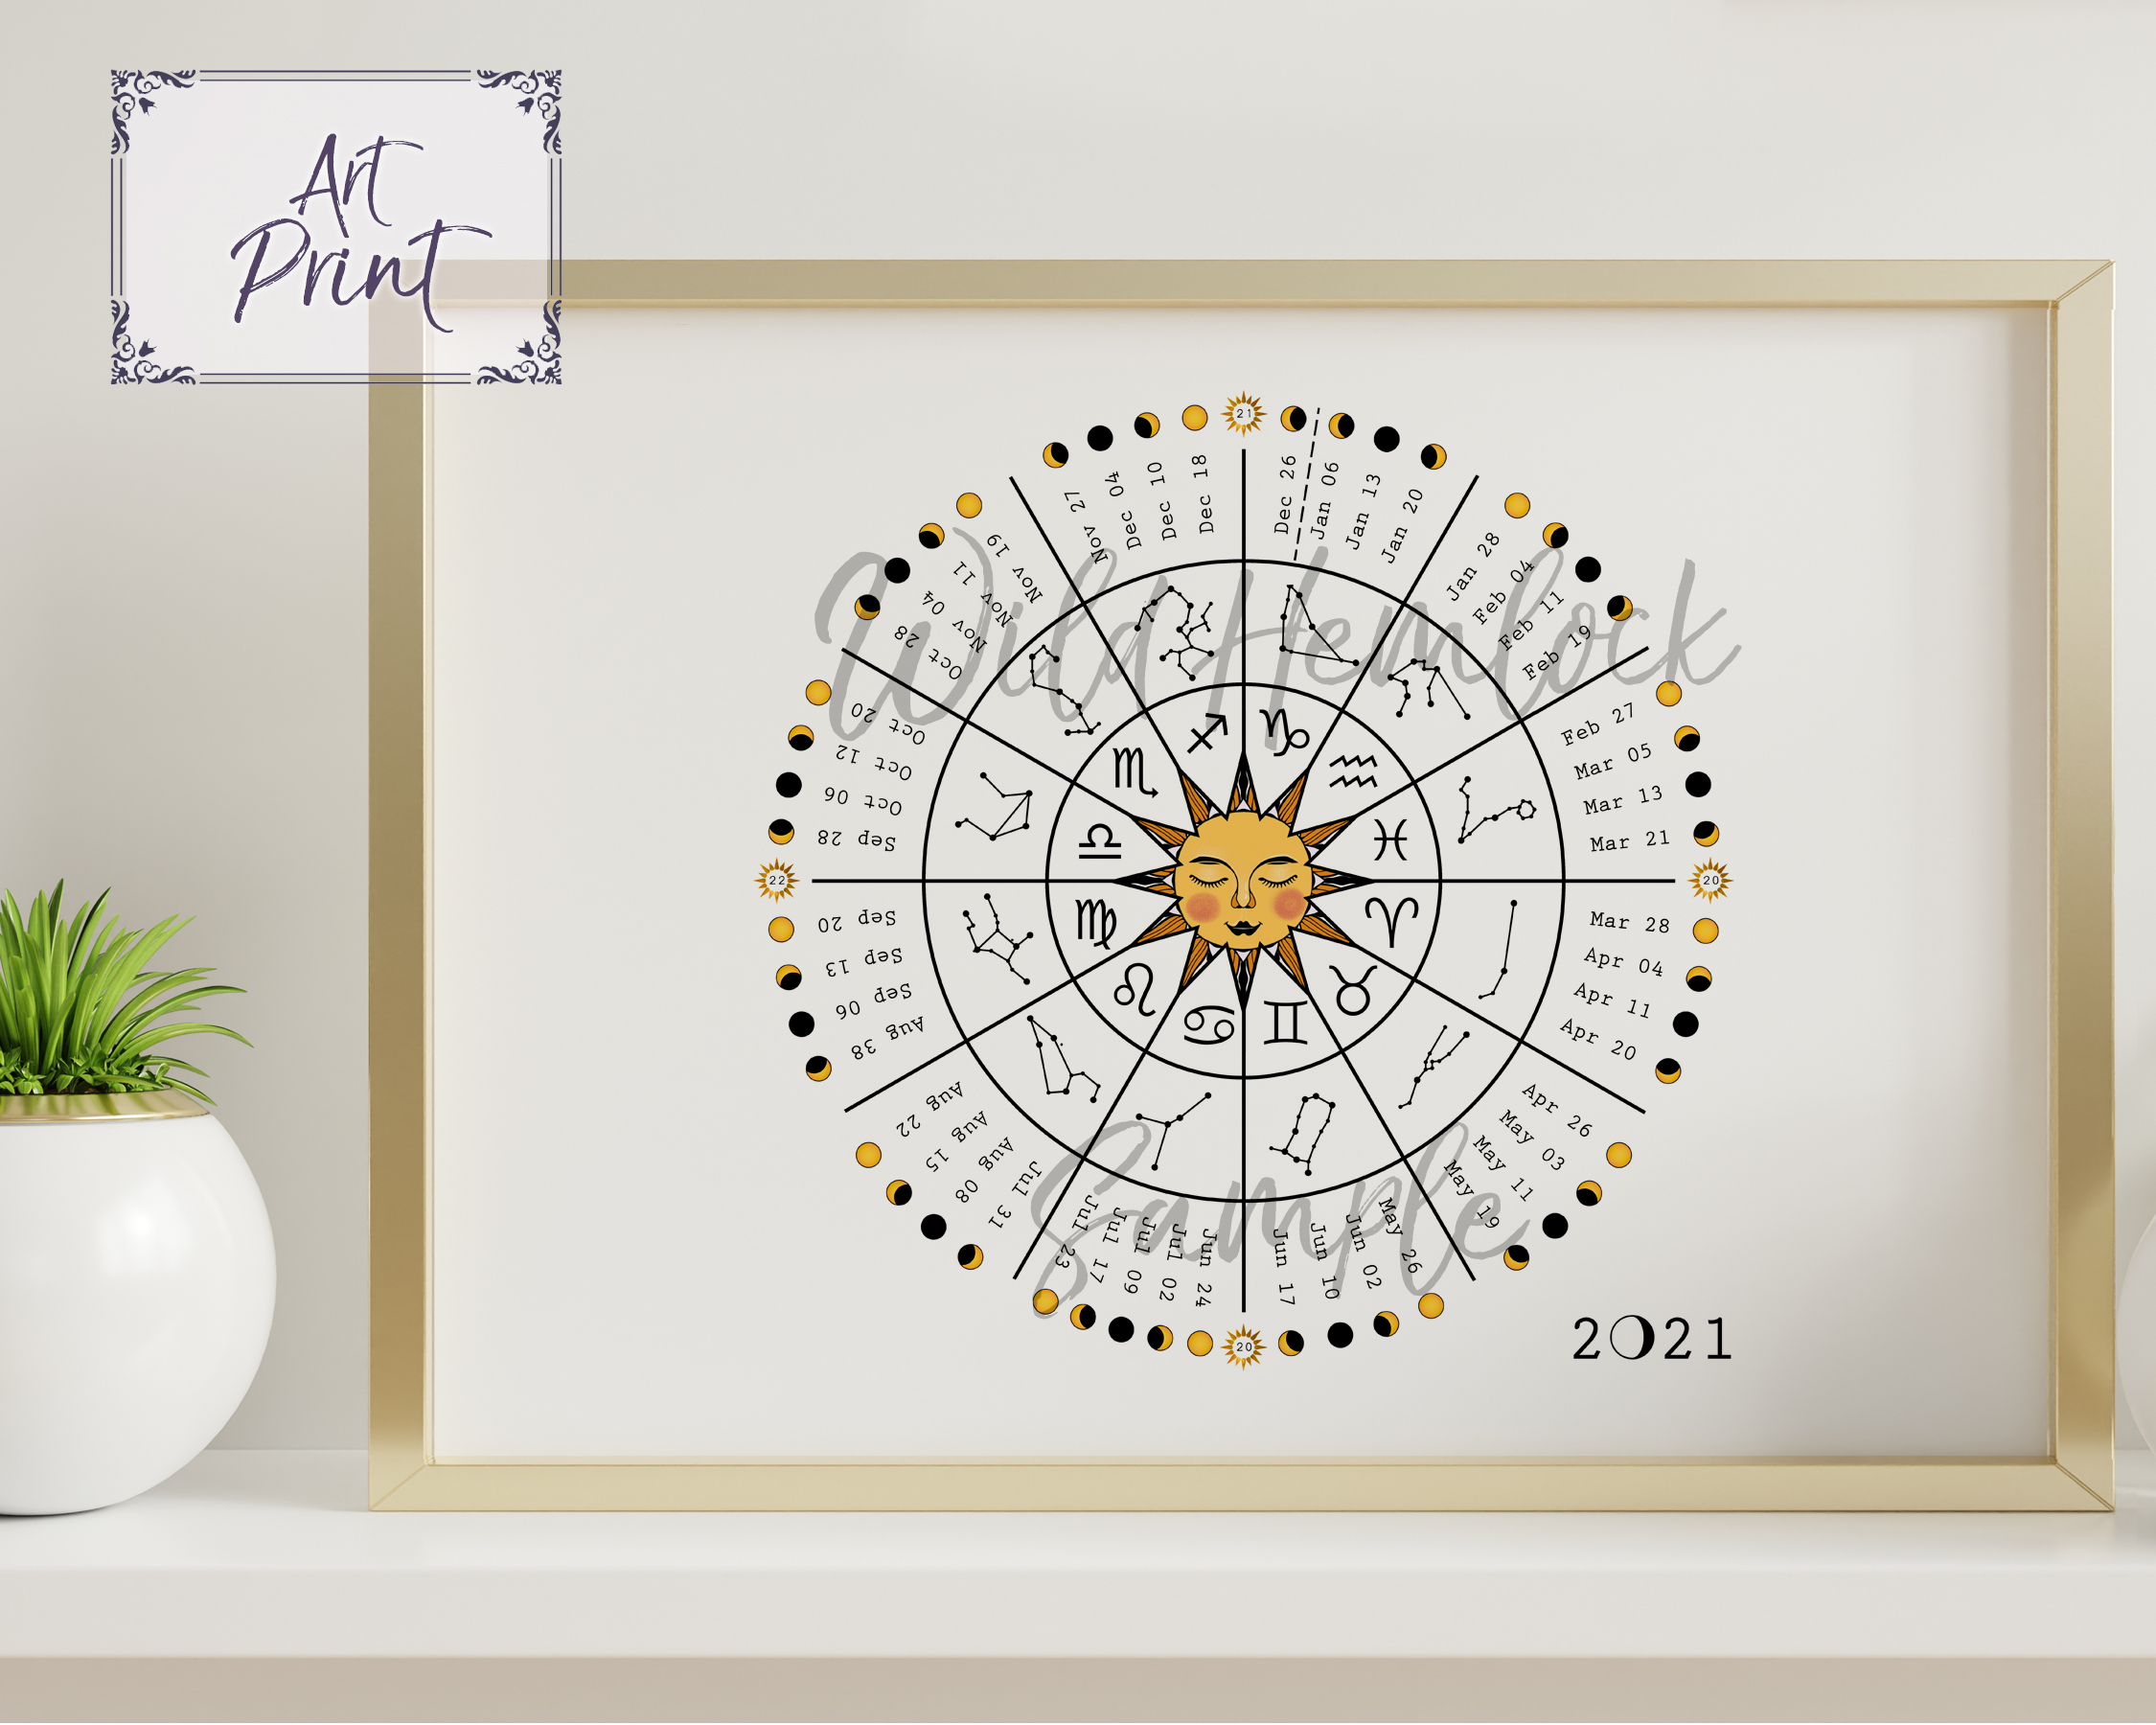 2021 Zodiac Wheel Astrology Moon Phase Calendar - Wild Hemlock